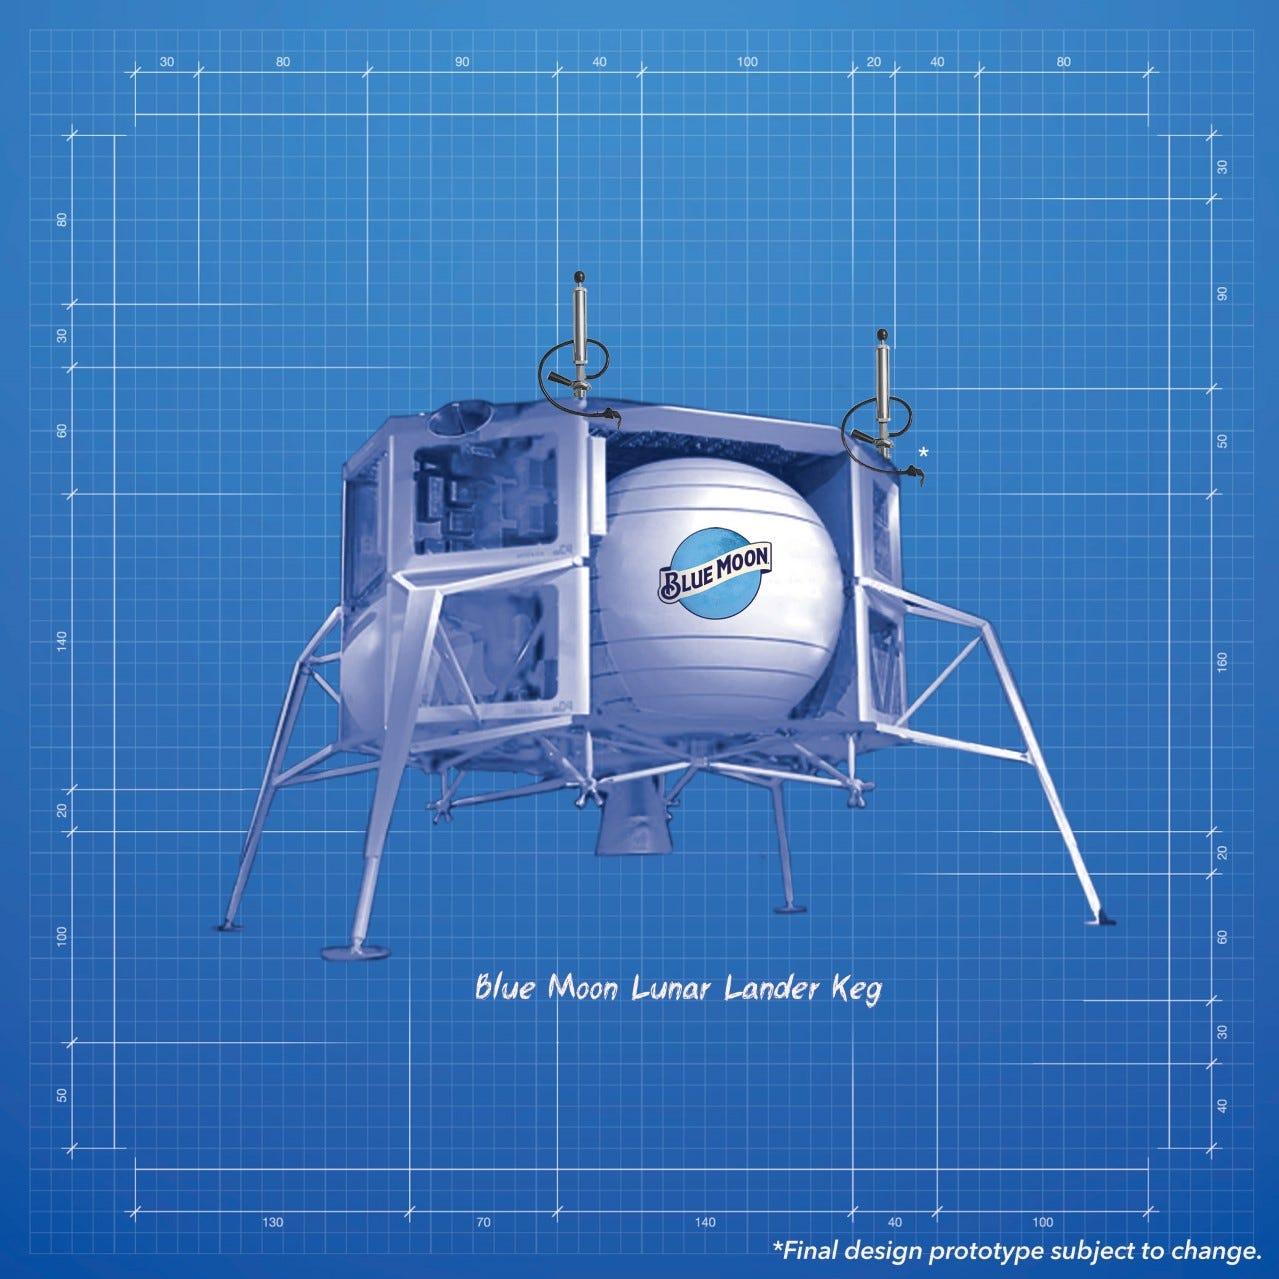 Blue Moon announces limited edition kegs in honor of Blue Origin's lunar lander